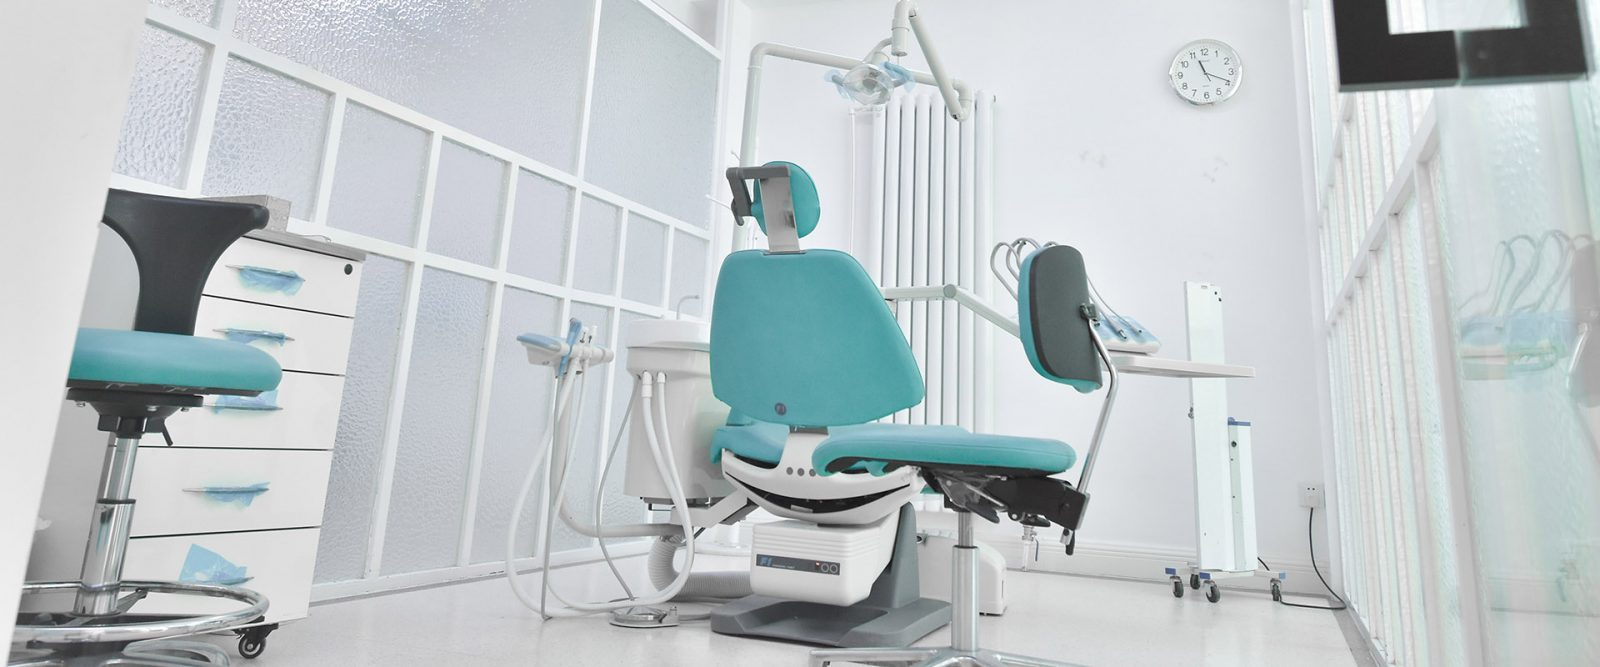 office-furniture-01